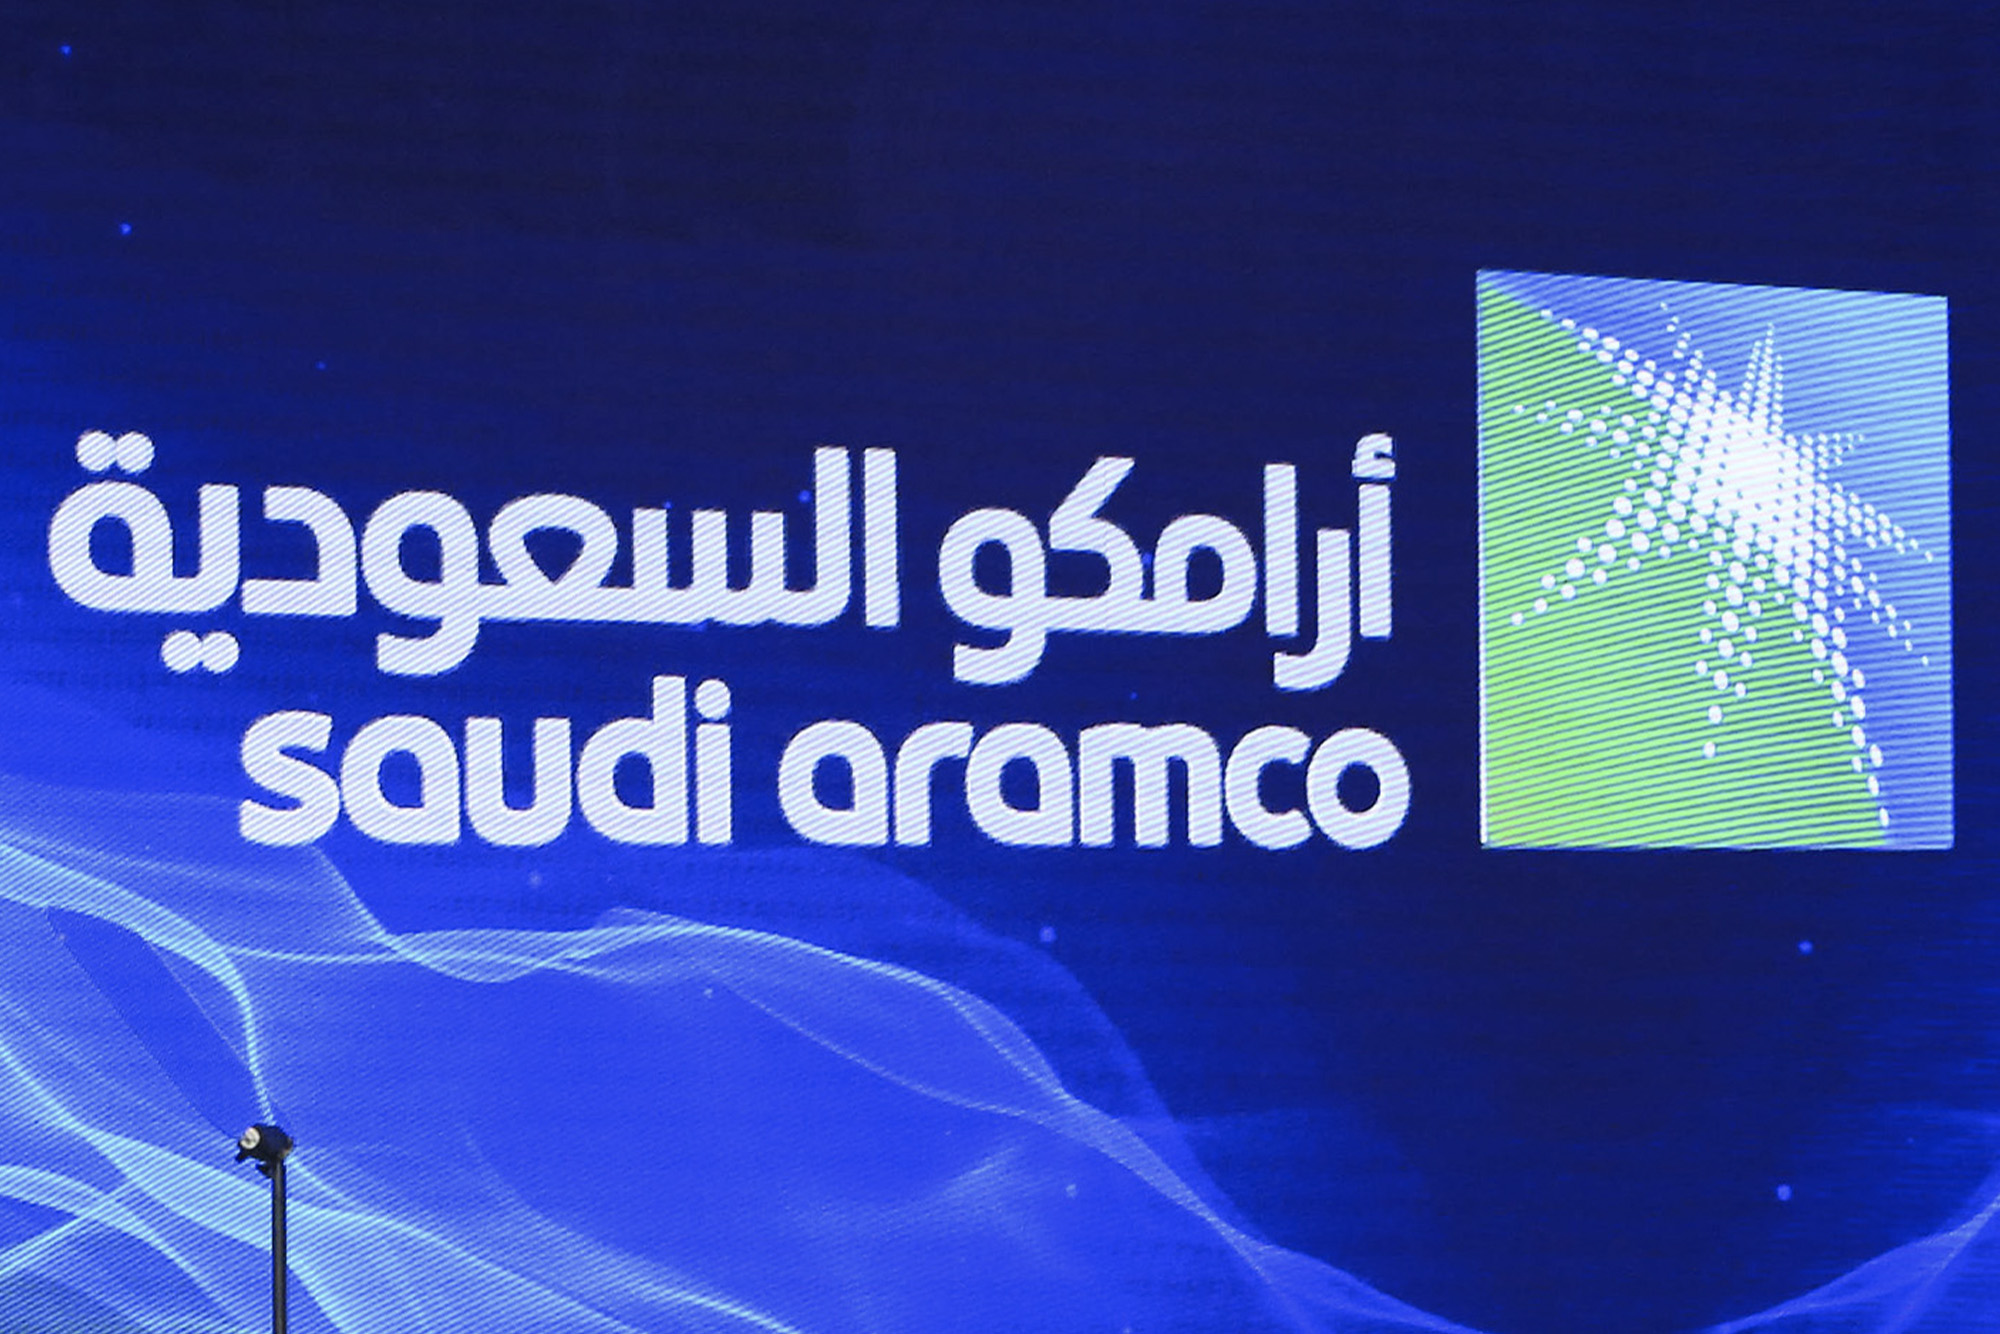 aramco2